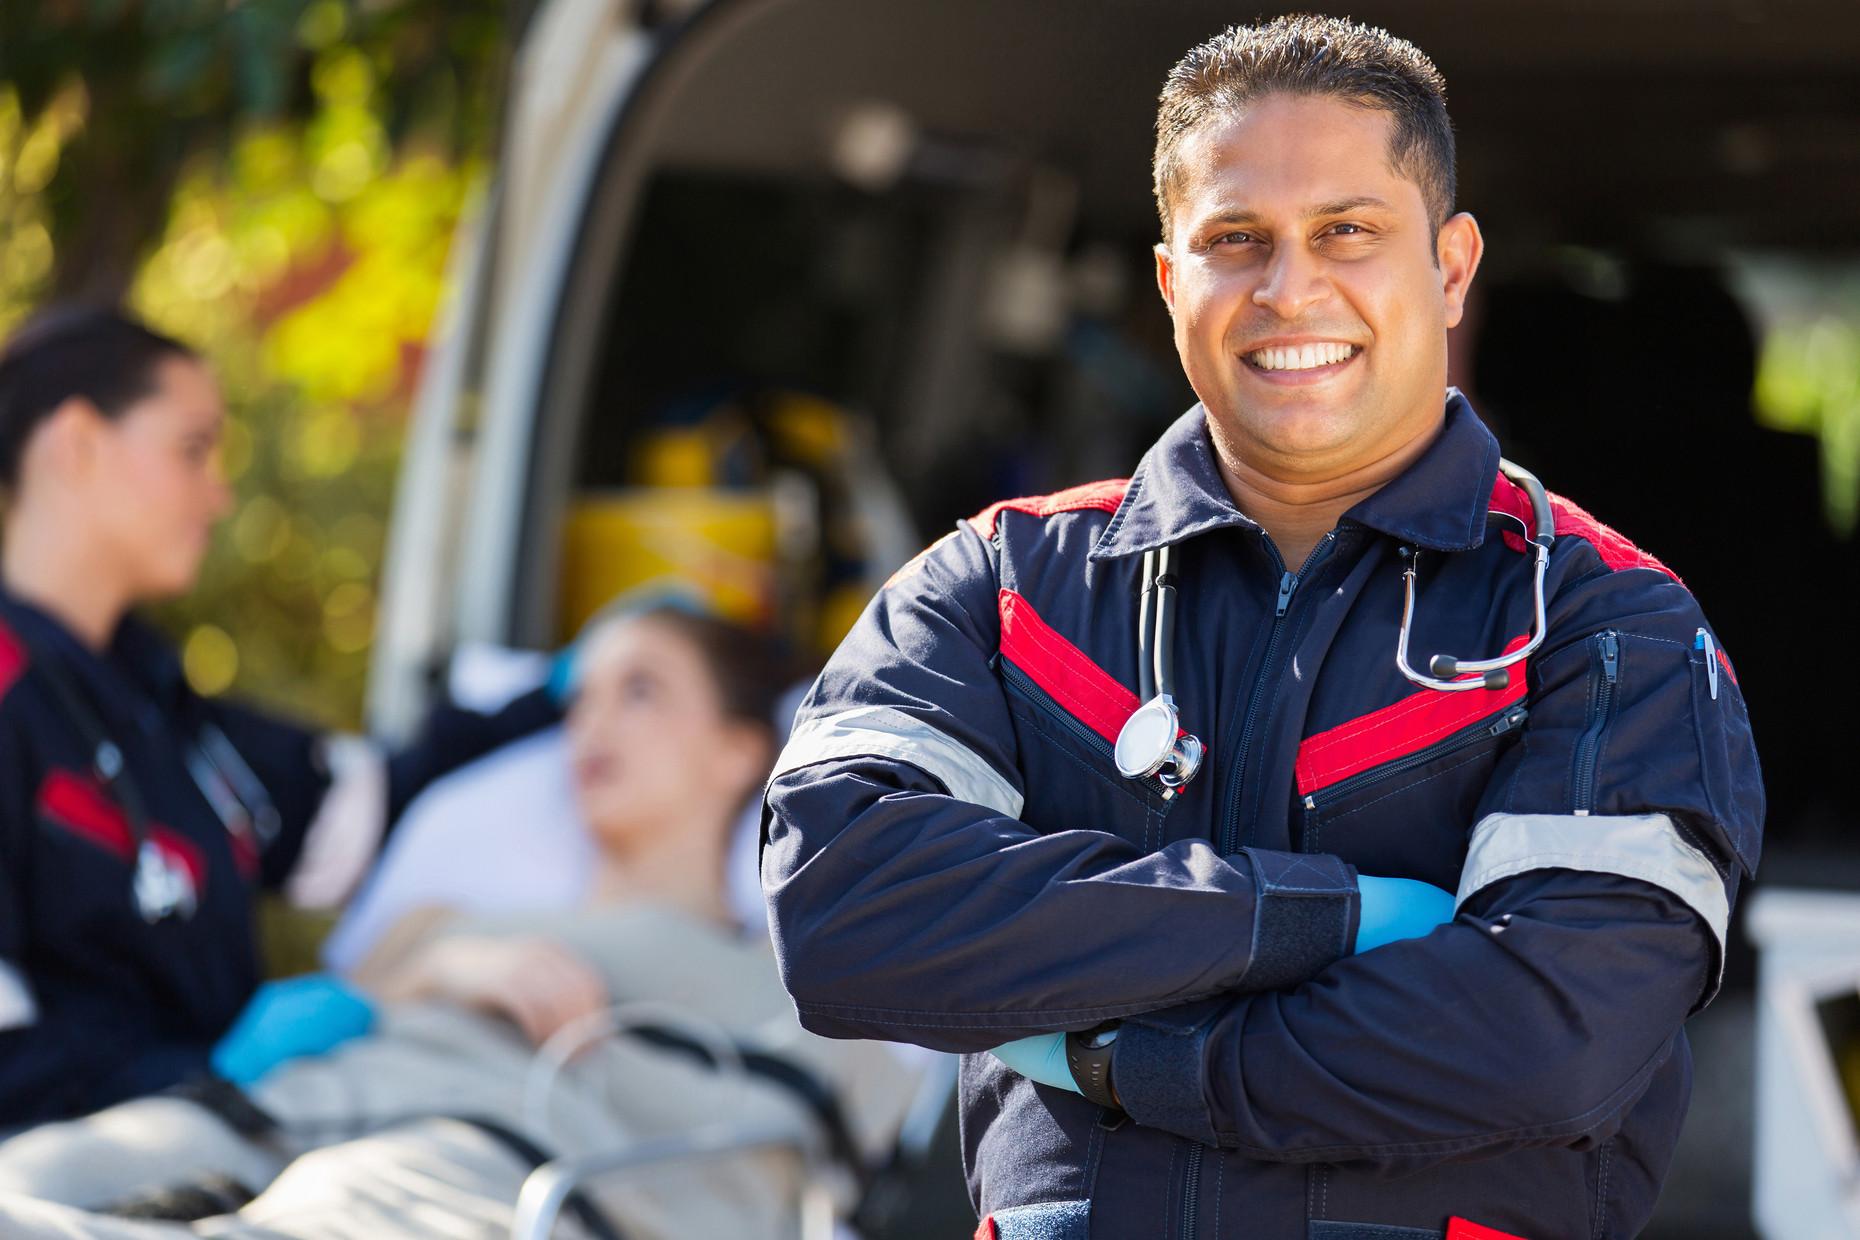 Happy Paramedic